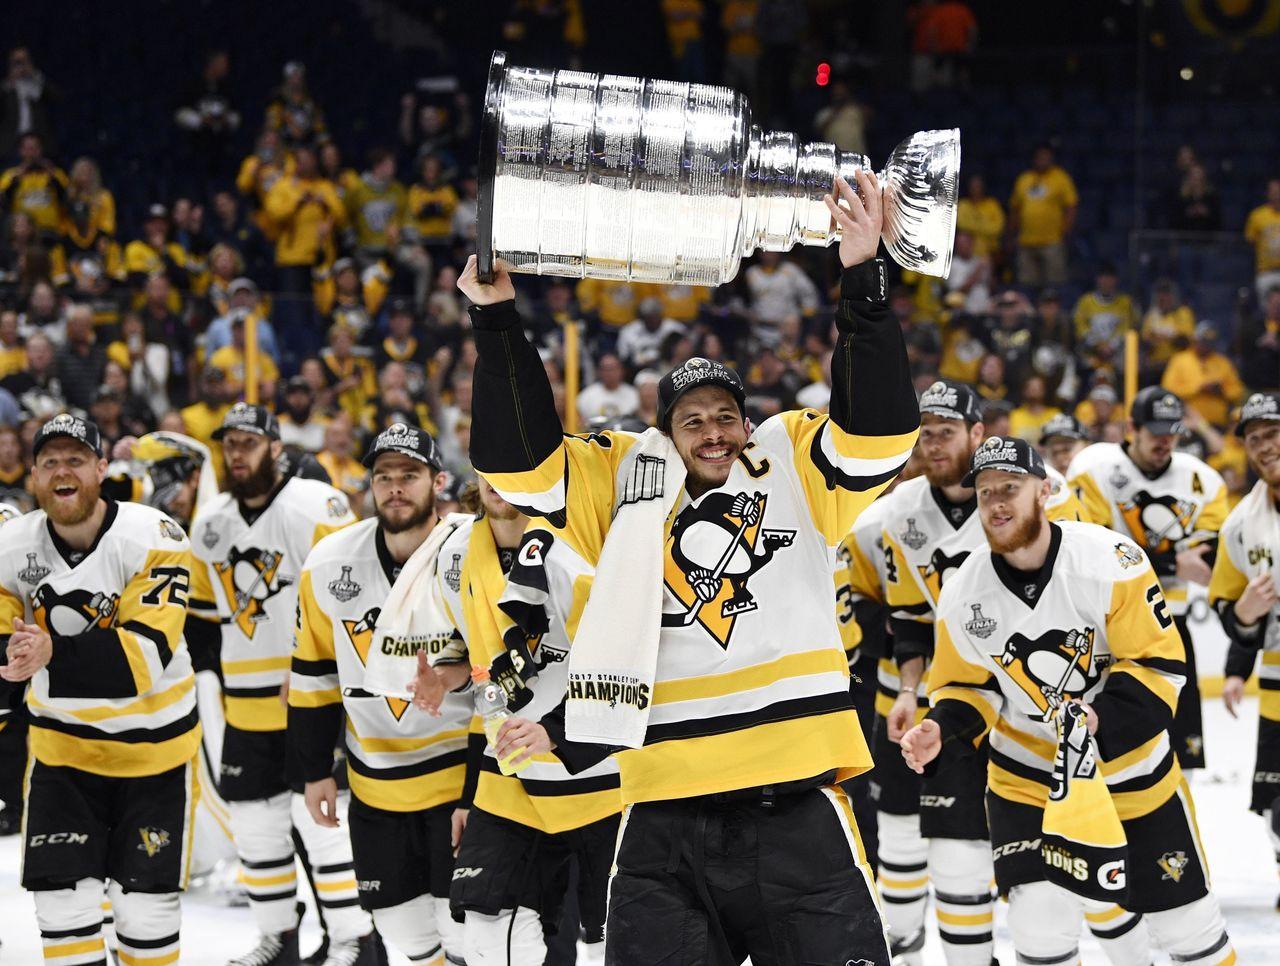 Cropped_2017-06-12t033440z_492740522_nocid_rtrmadp_3_nhl-stanley-cup-final-pittsburgh-penguins-at-nashville-predators